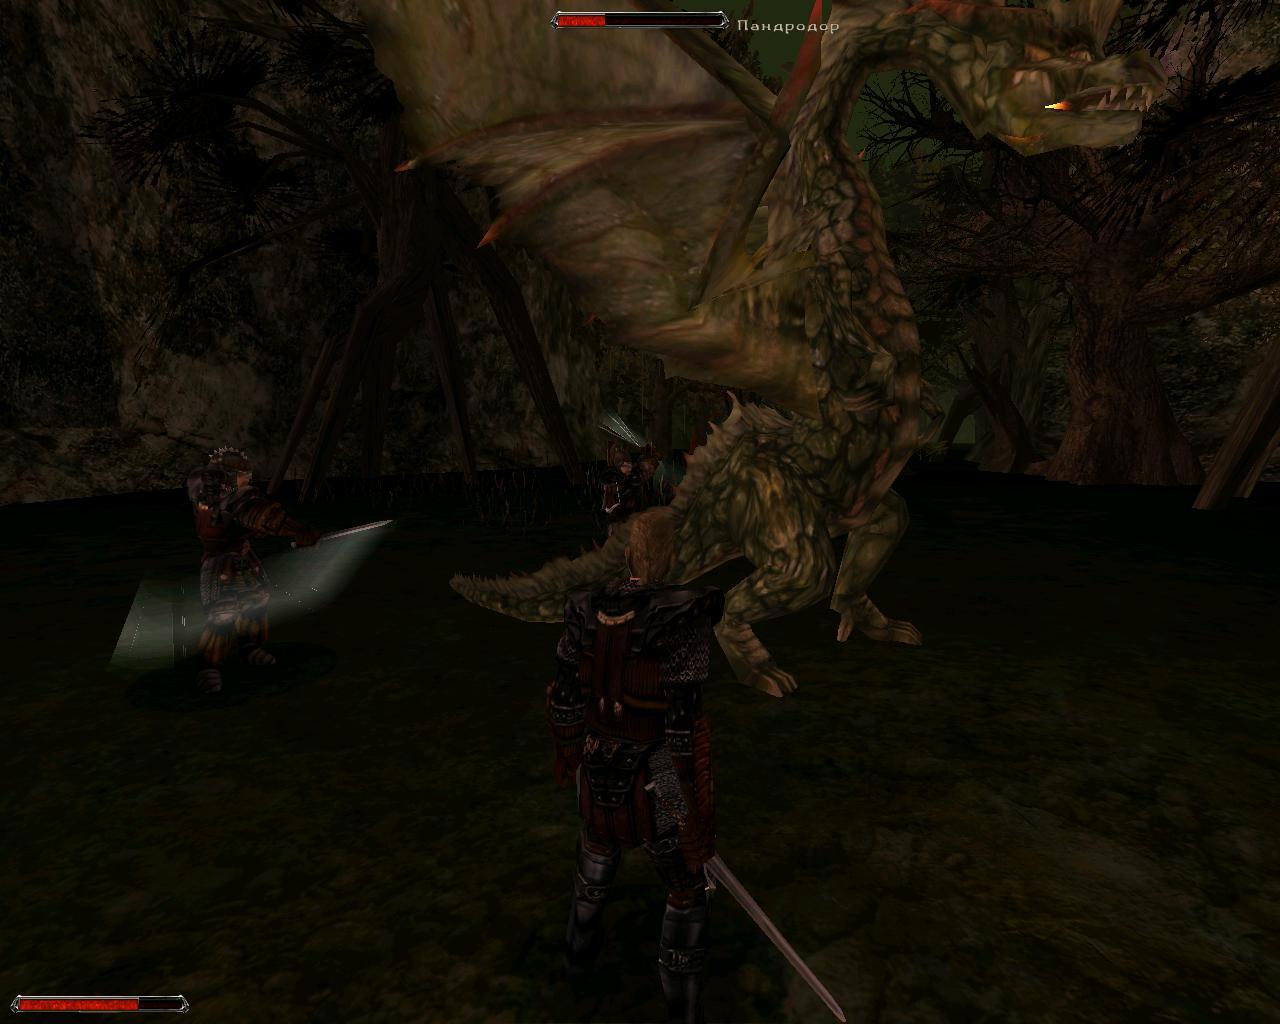 Три дракони фото 2 фотография